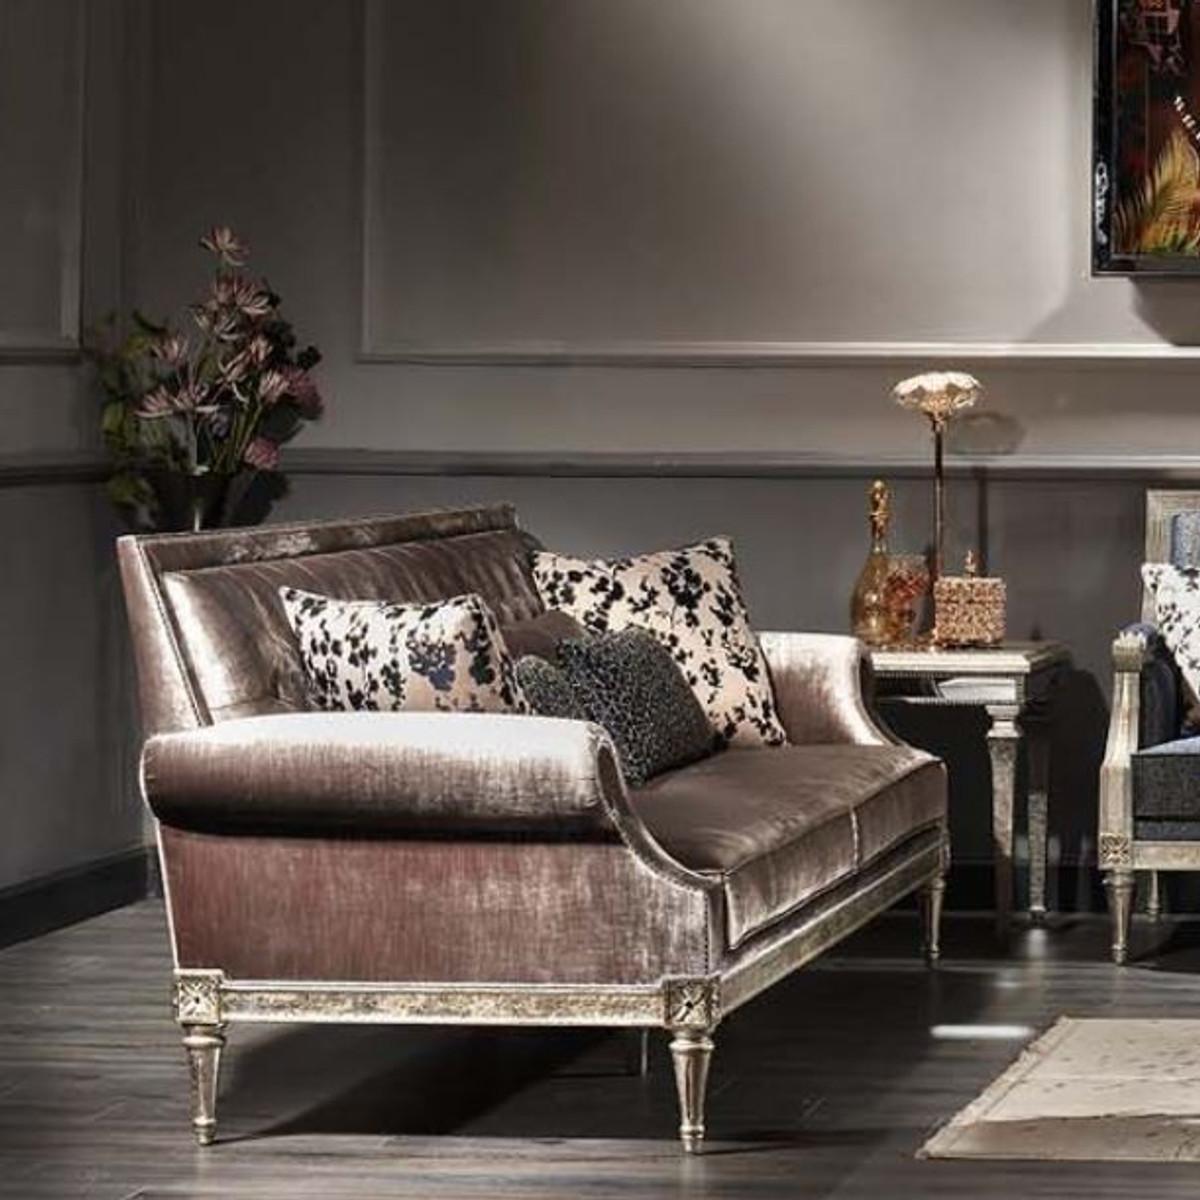 Casa Padrino Luxus Barock Wohnzimmer Samt Sofa Rosa / Antik Silber 250 x 88 x H. 100 cm - Edel & Prunkvoll 4